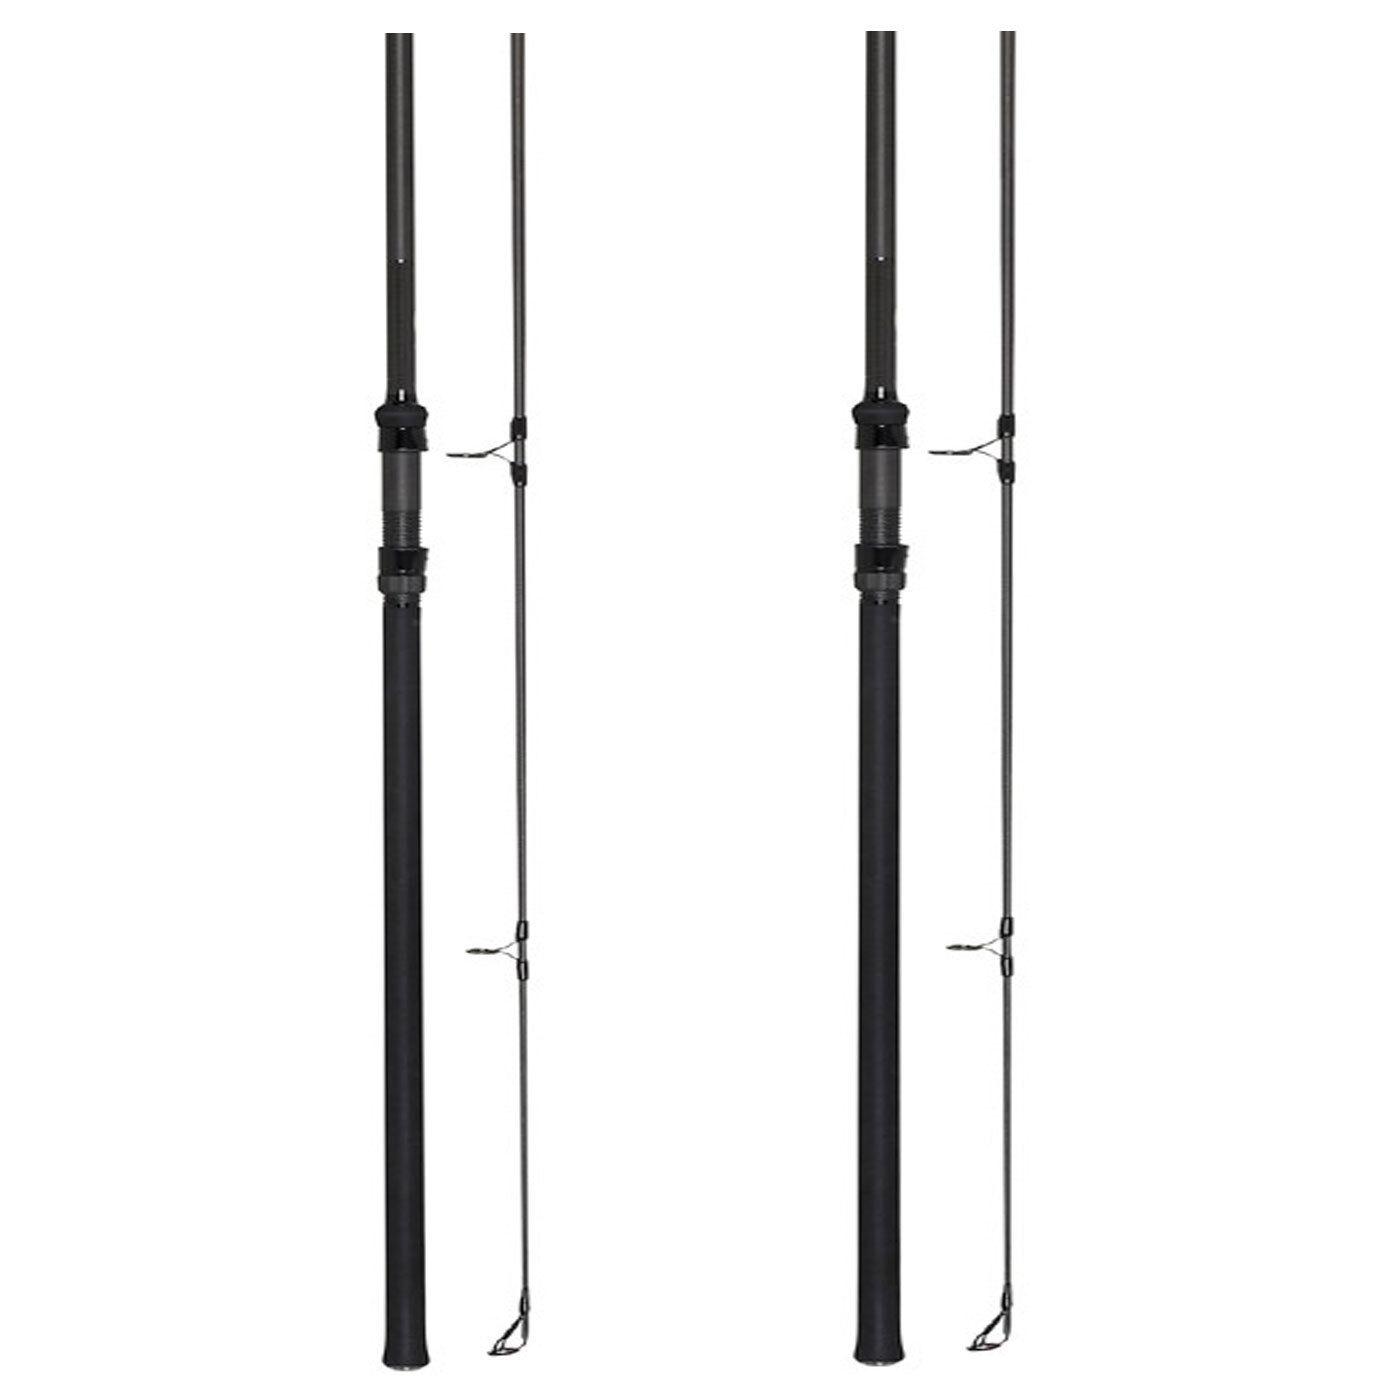 Greys Xlerate Duplon 12ft 3.5lb T.C Carp Rod -Set of 2-  Brand New 2018